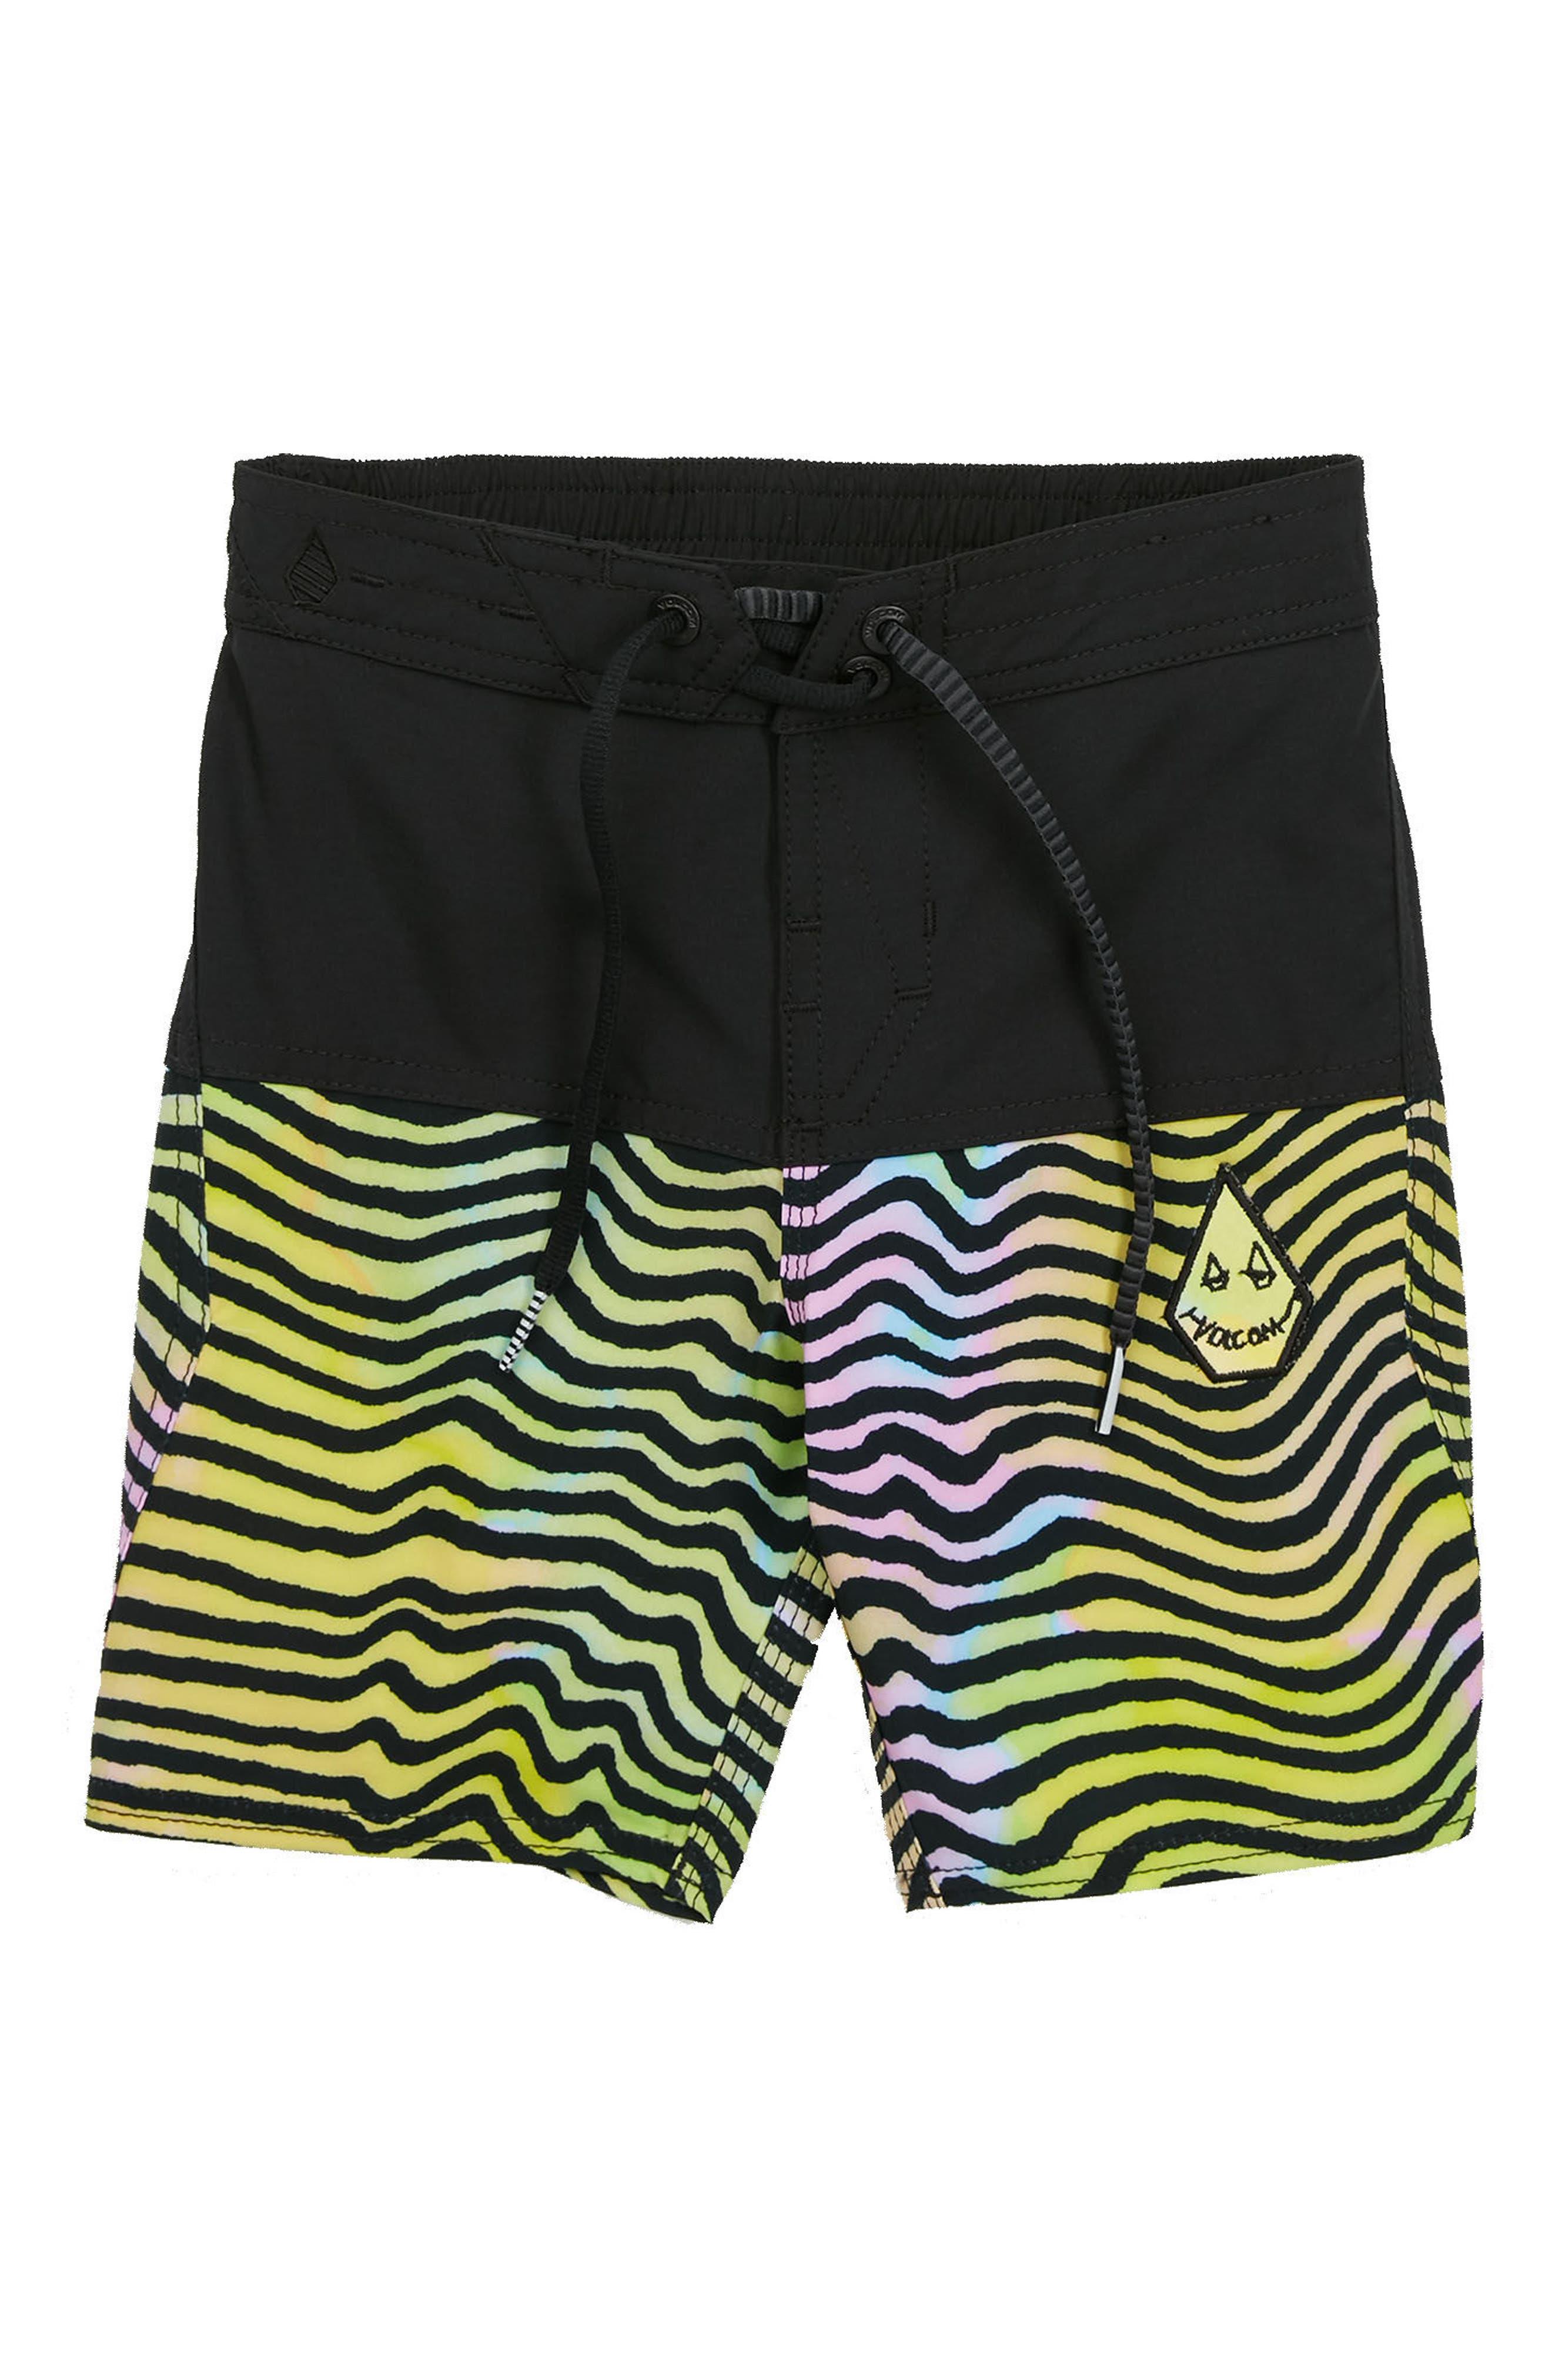 VOLCOM Vibes Board Shorts, Main, color, 001